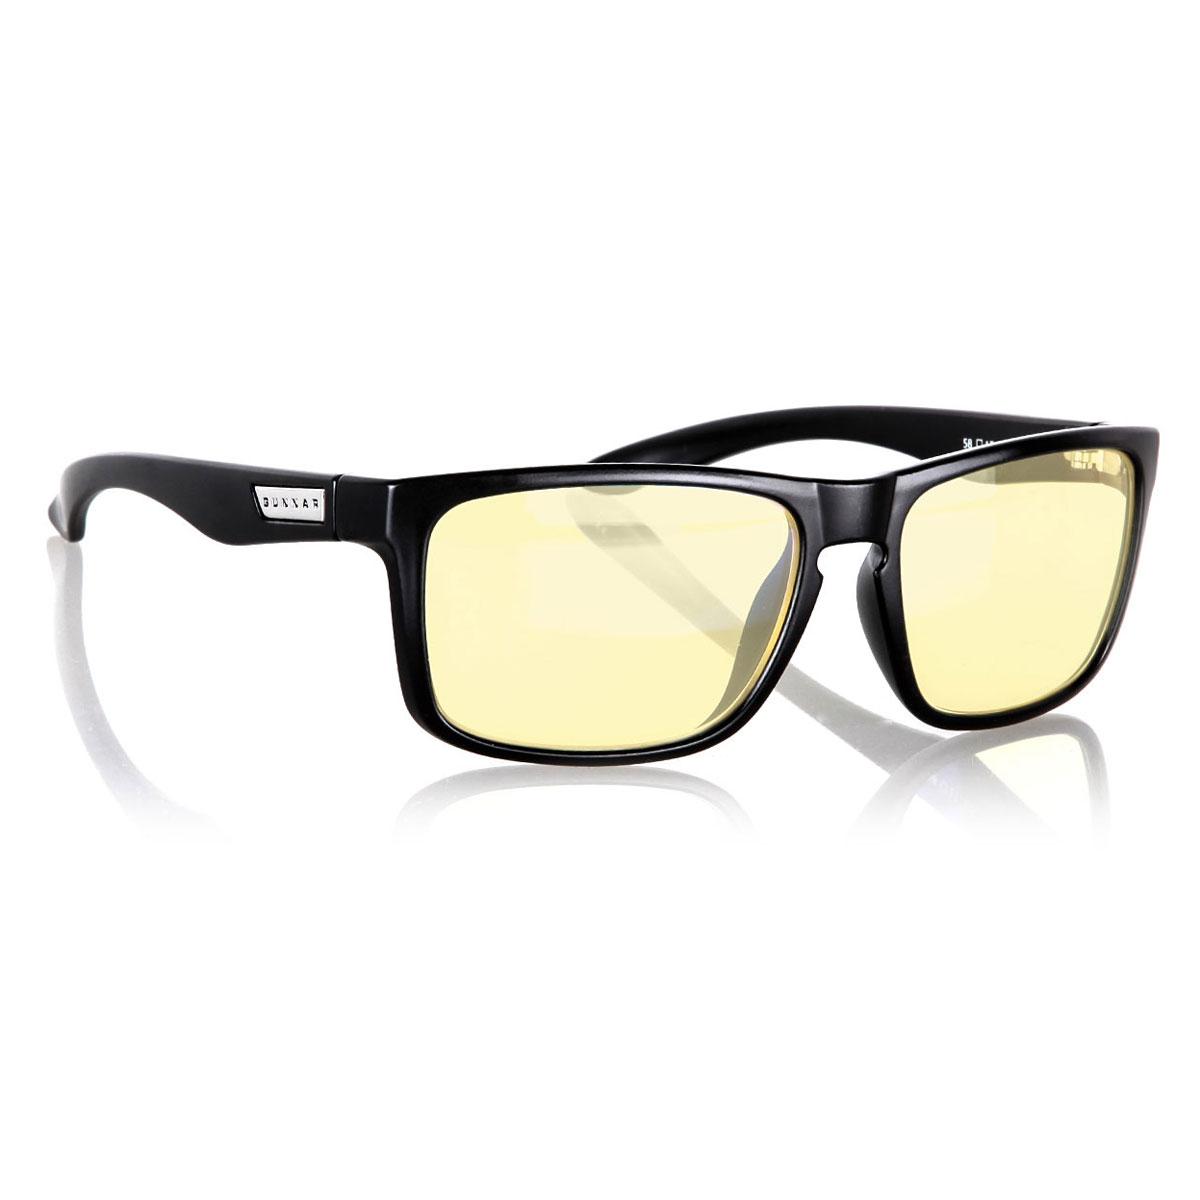 gunnar intercept onyx lunettes de protection gunnar. Black Bedroom Furniture Sets. Home Design Ideas